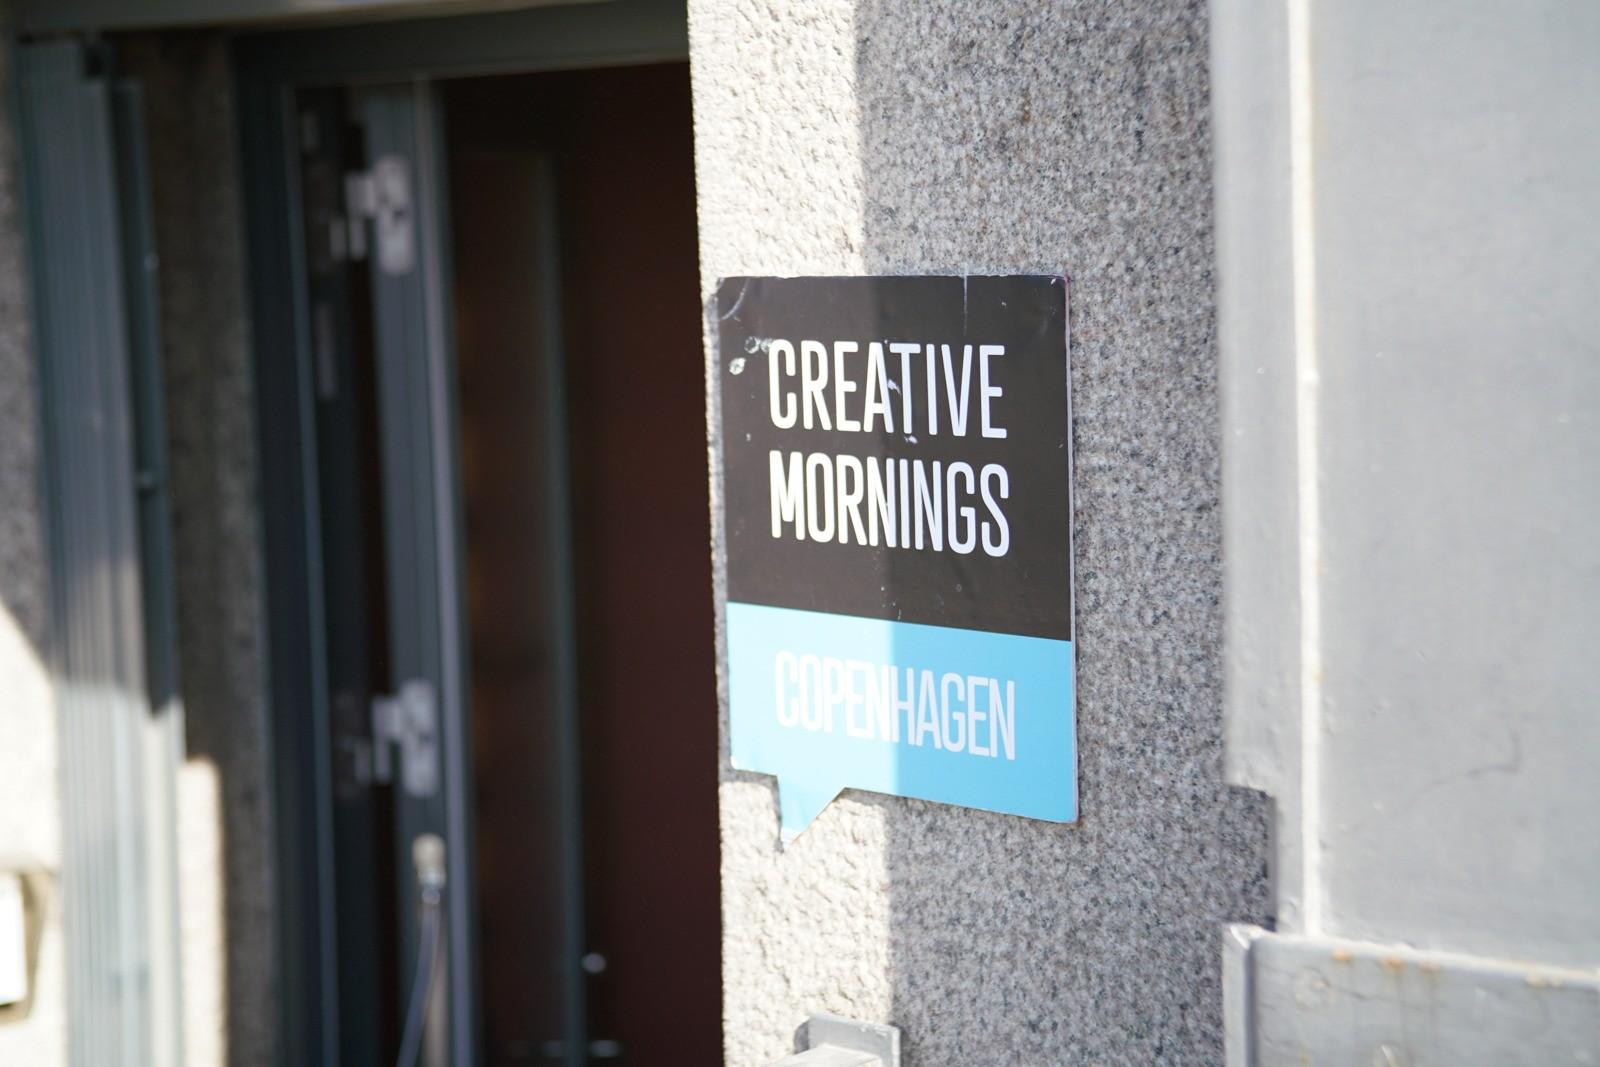 Event fotografering: Creative Mornings Cph - skudt med Lomography Neptune